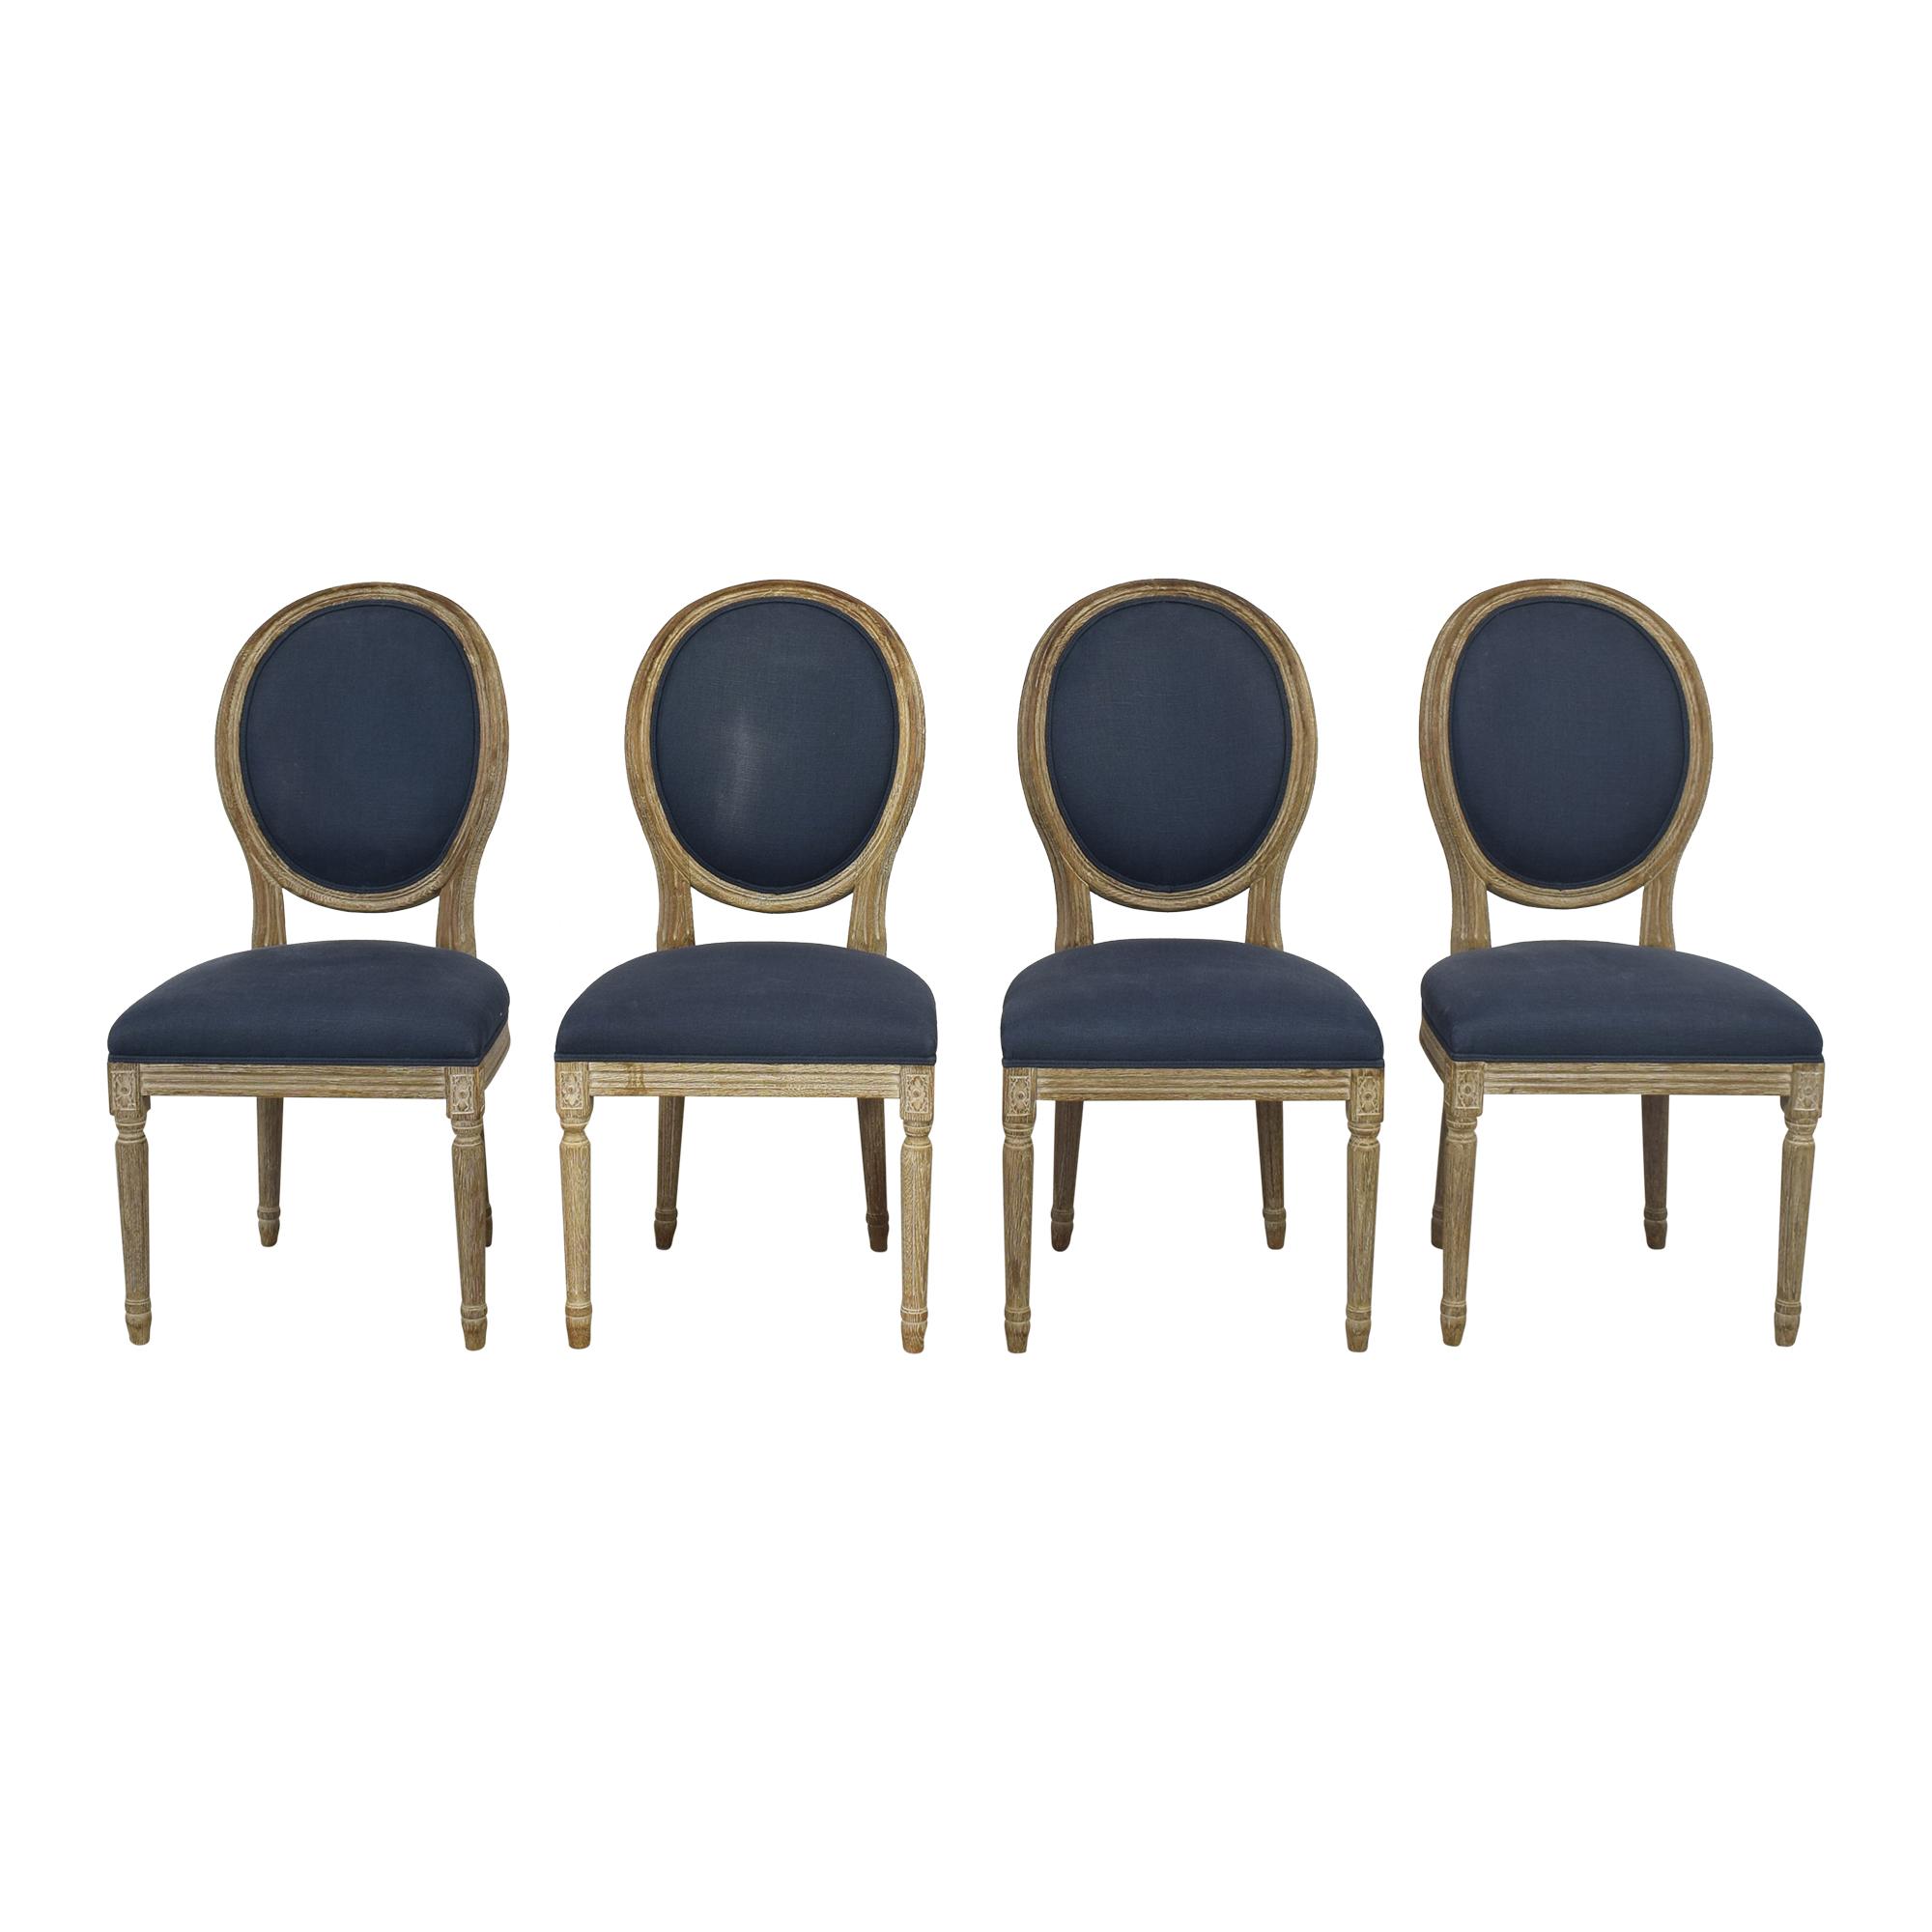 Restoration Hardware Vintage French Round Dining Chairs Restoration Hardware